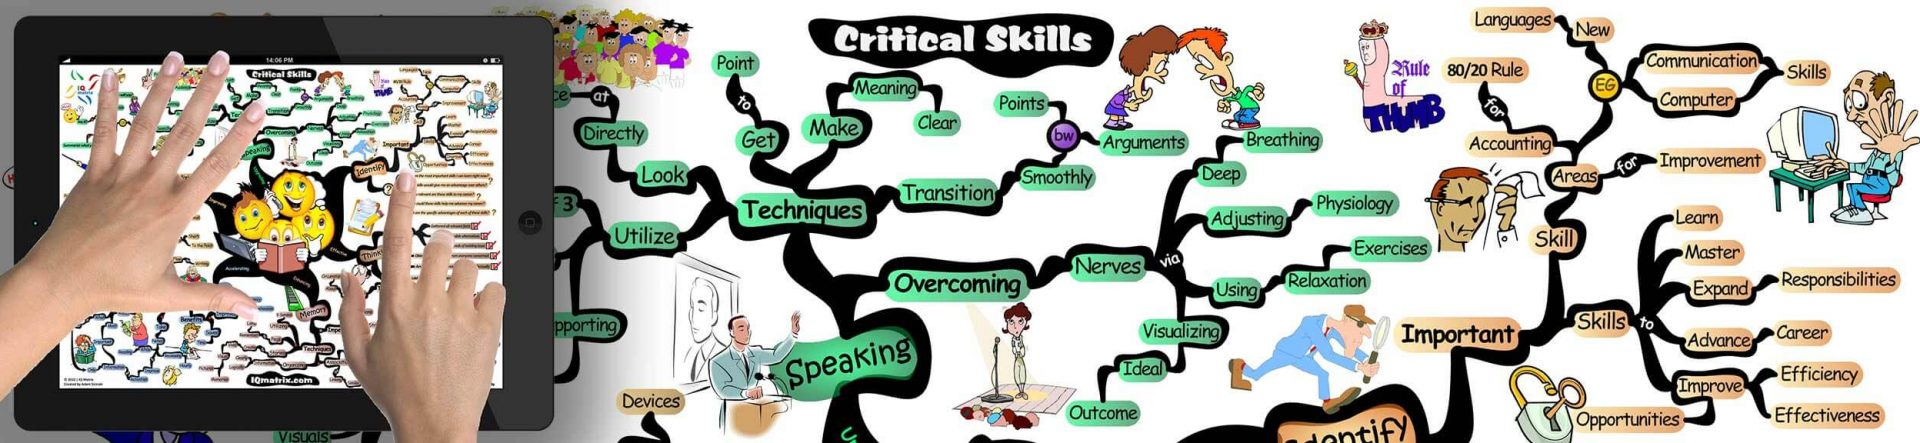 Critical Career Skills